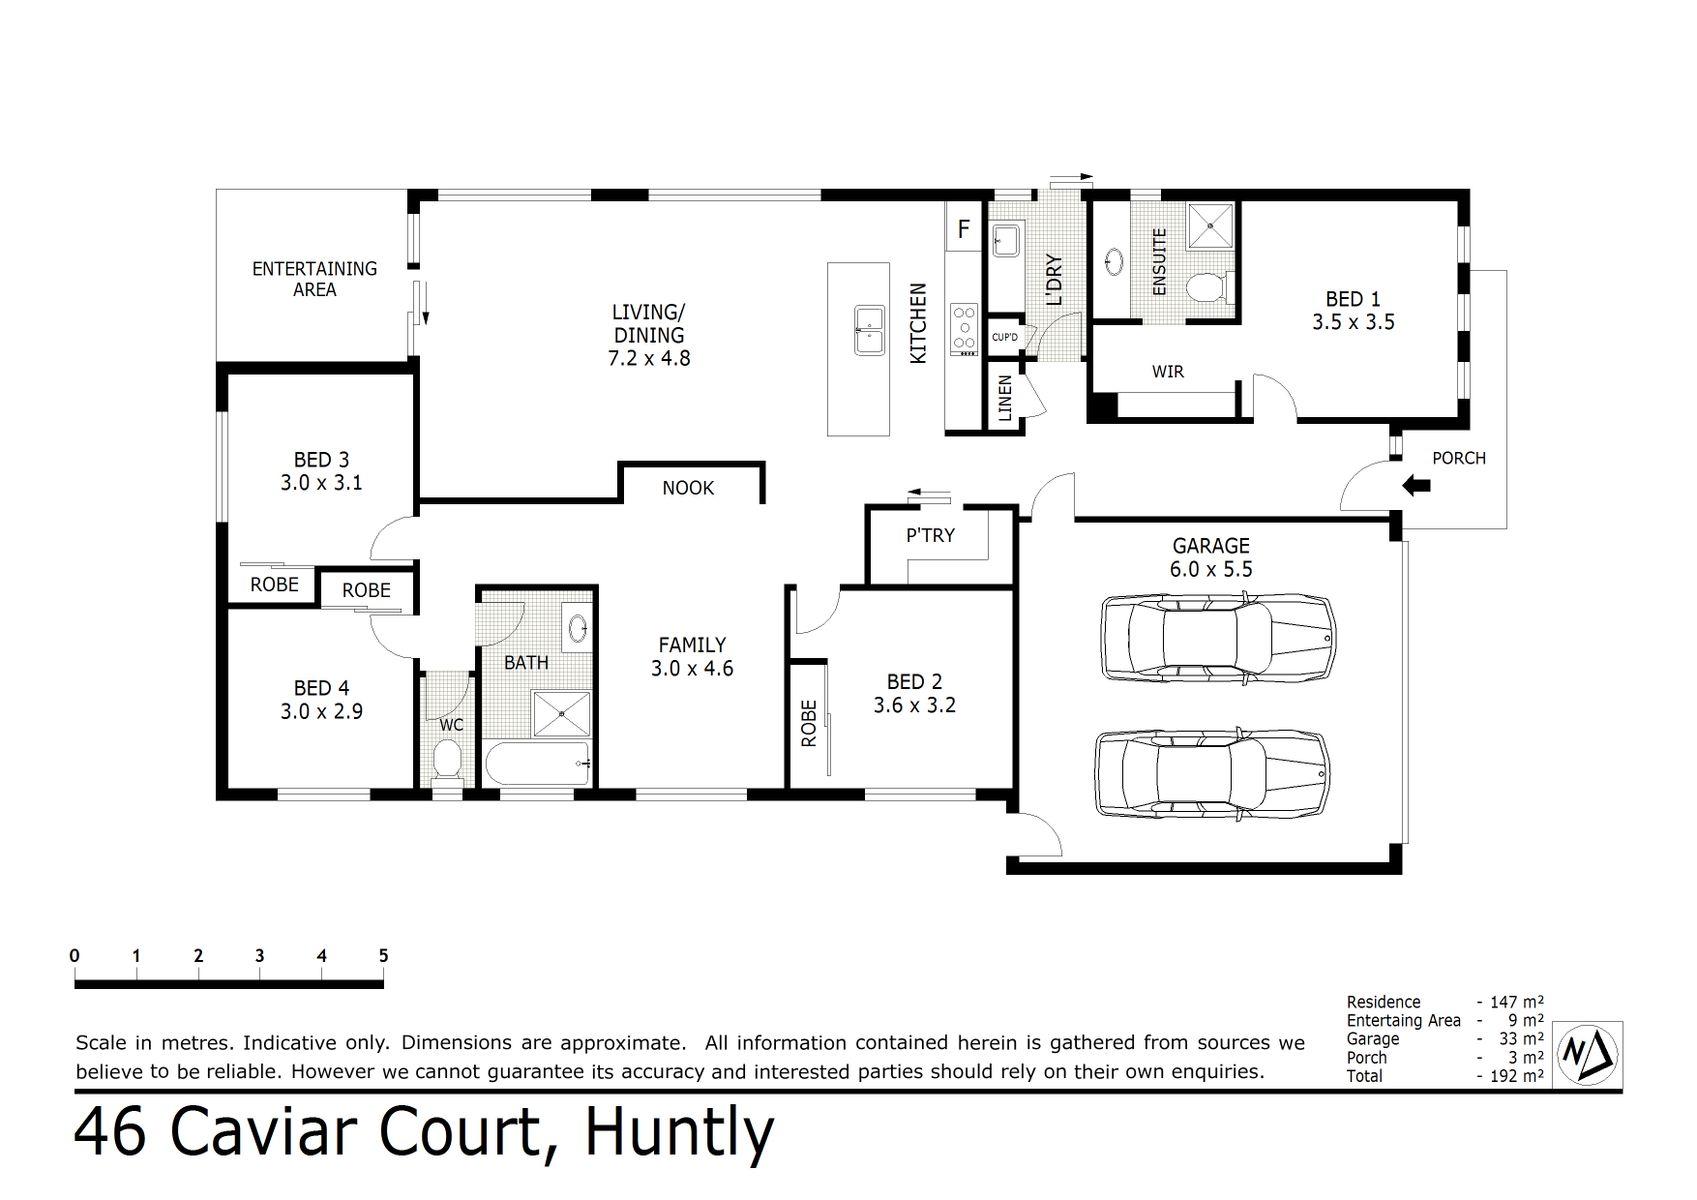 46 Caviar Court, Huntly, VIC 3551